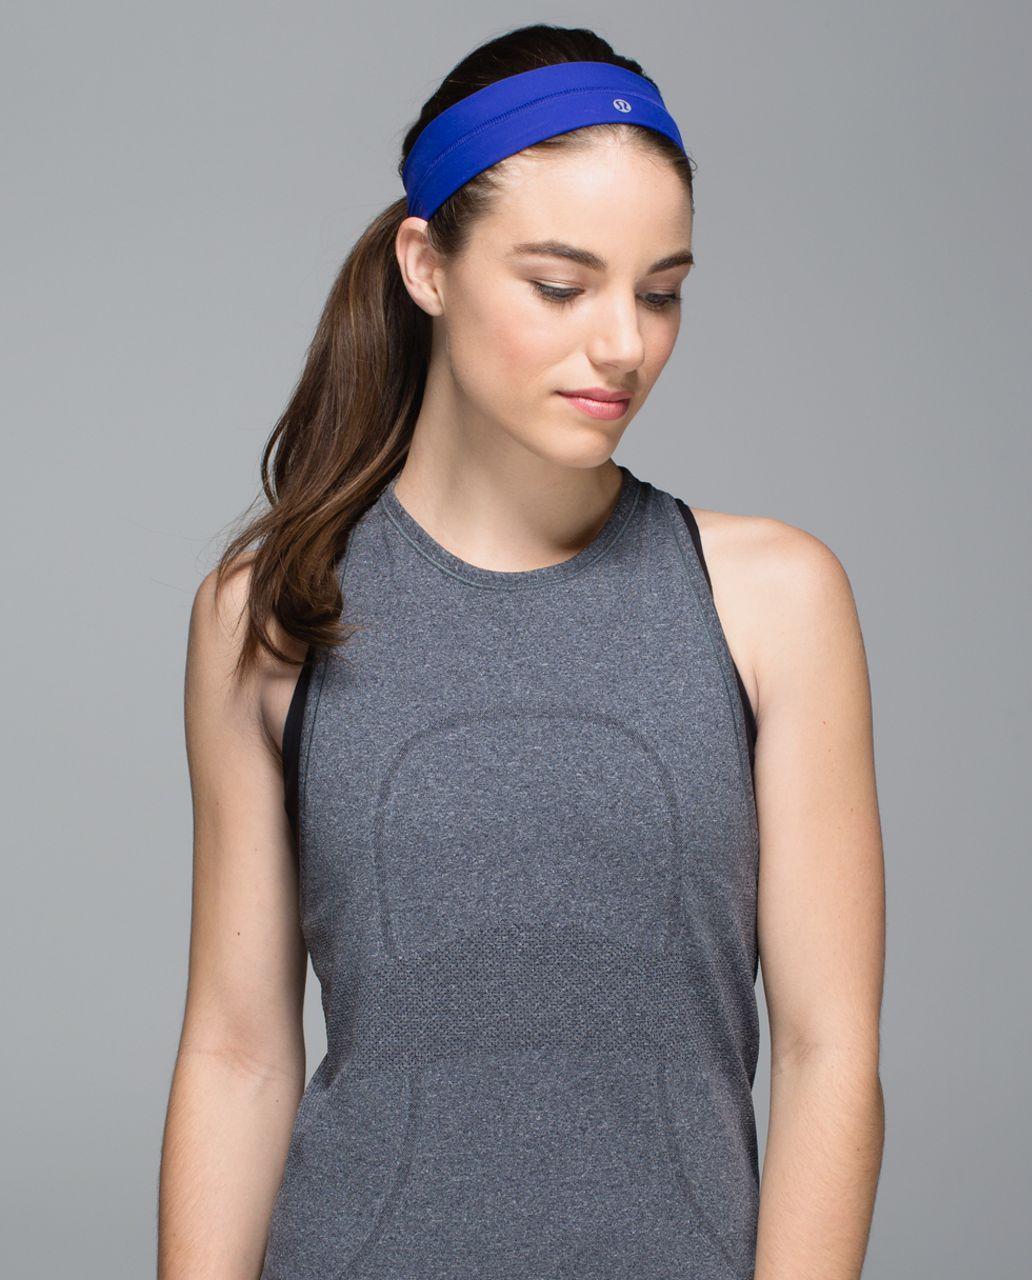 Lululemon Fly Away Tamer Headband - Pigment Blue